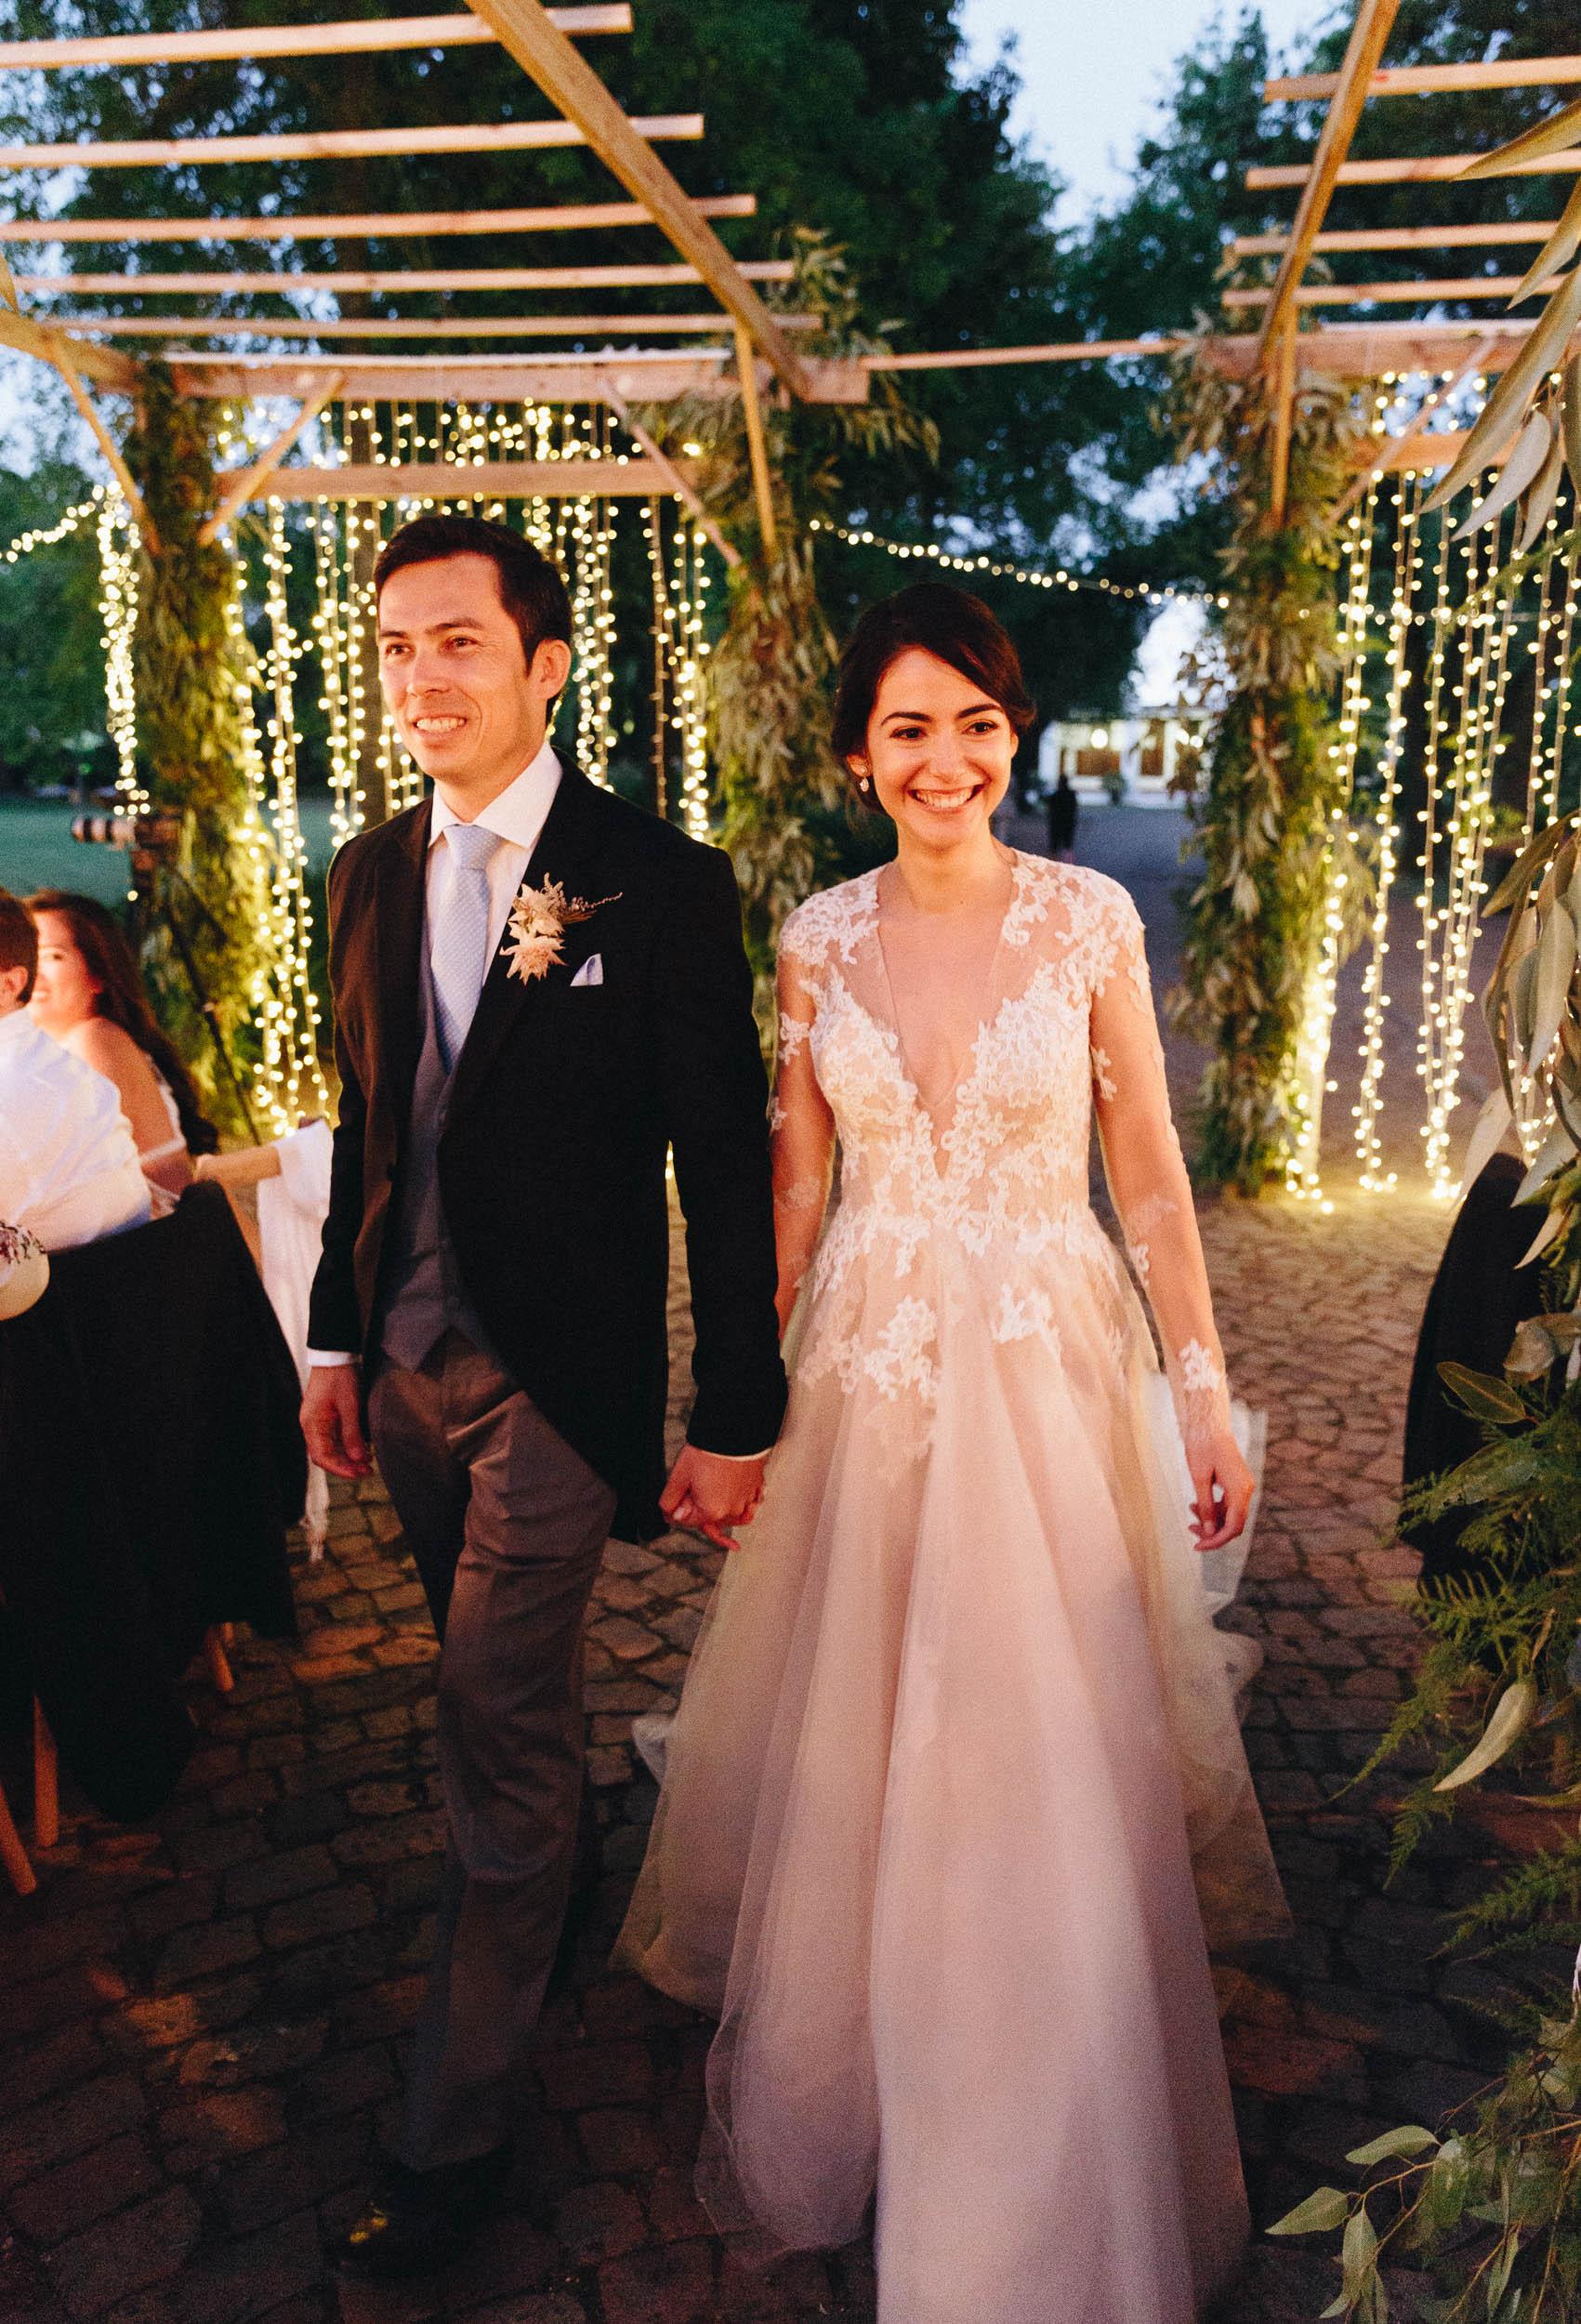 Jenny-Rockett-John-Scranton-Cape-Town-Wedding-Photographer-Andrea-Kellan-205.jpg